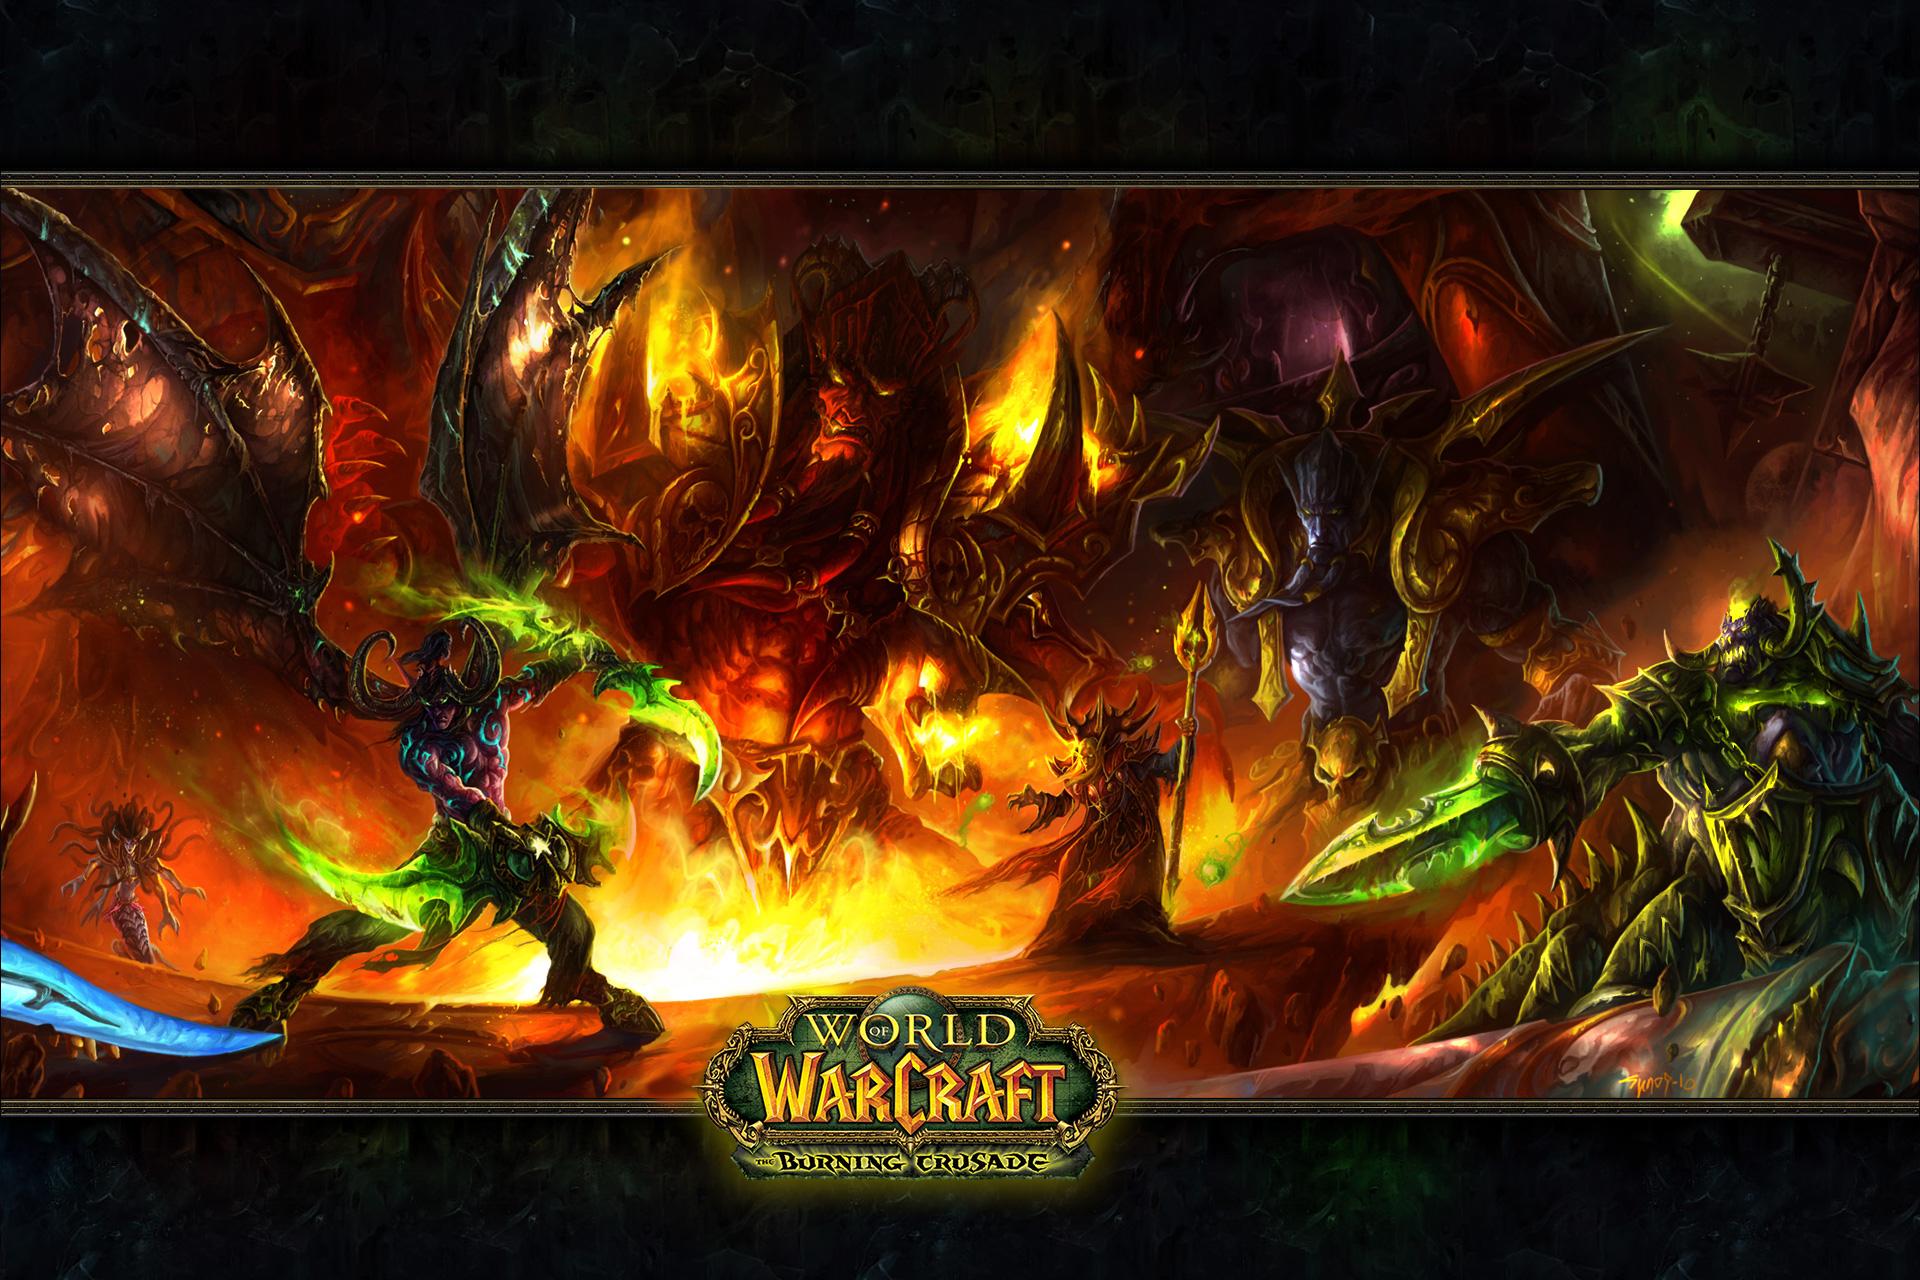 World of Warcraft wallpaper 31